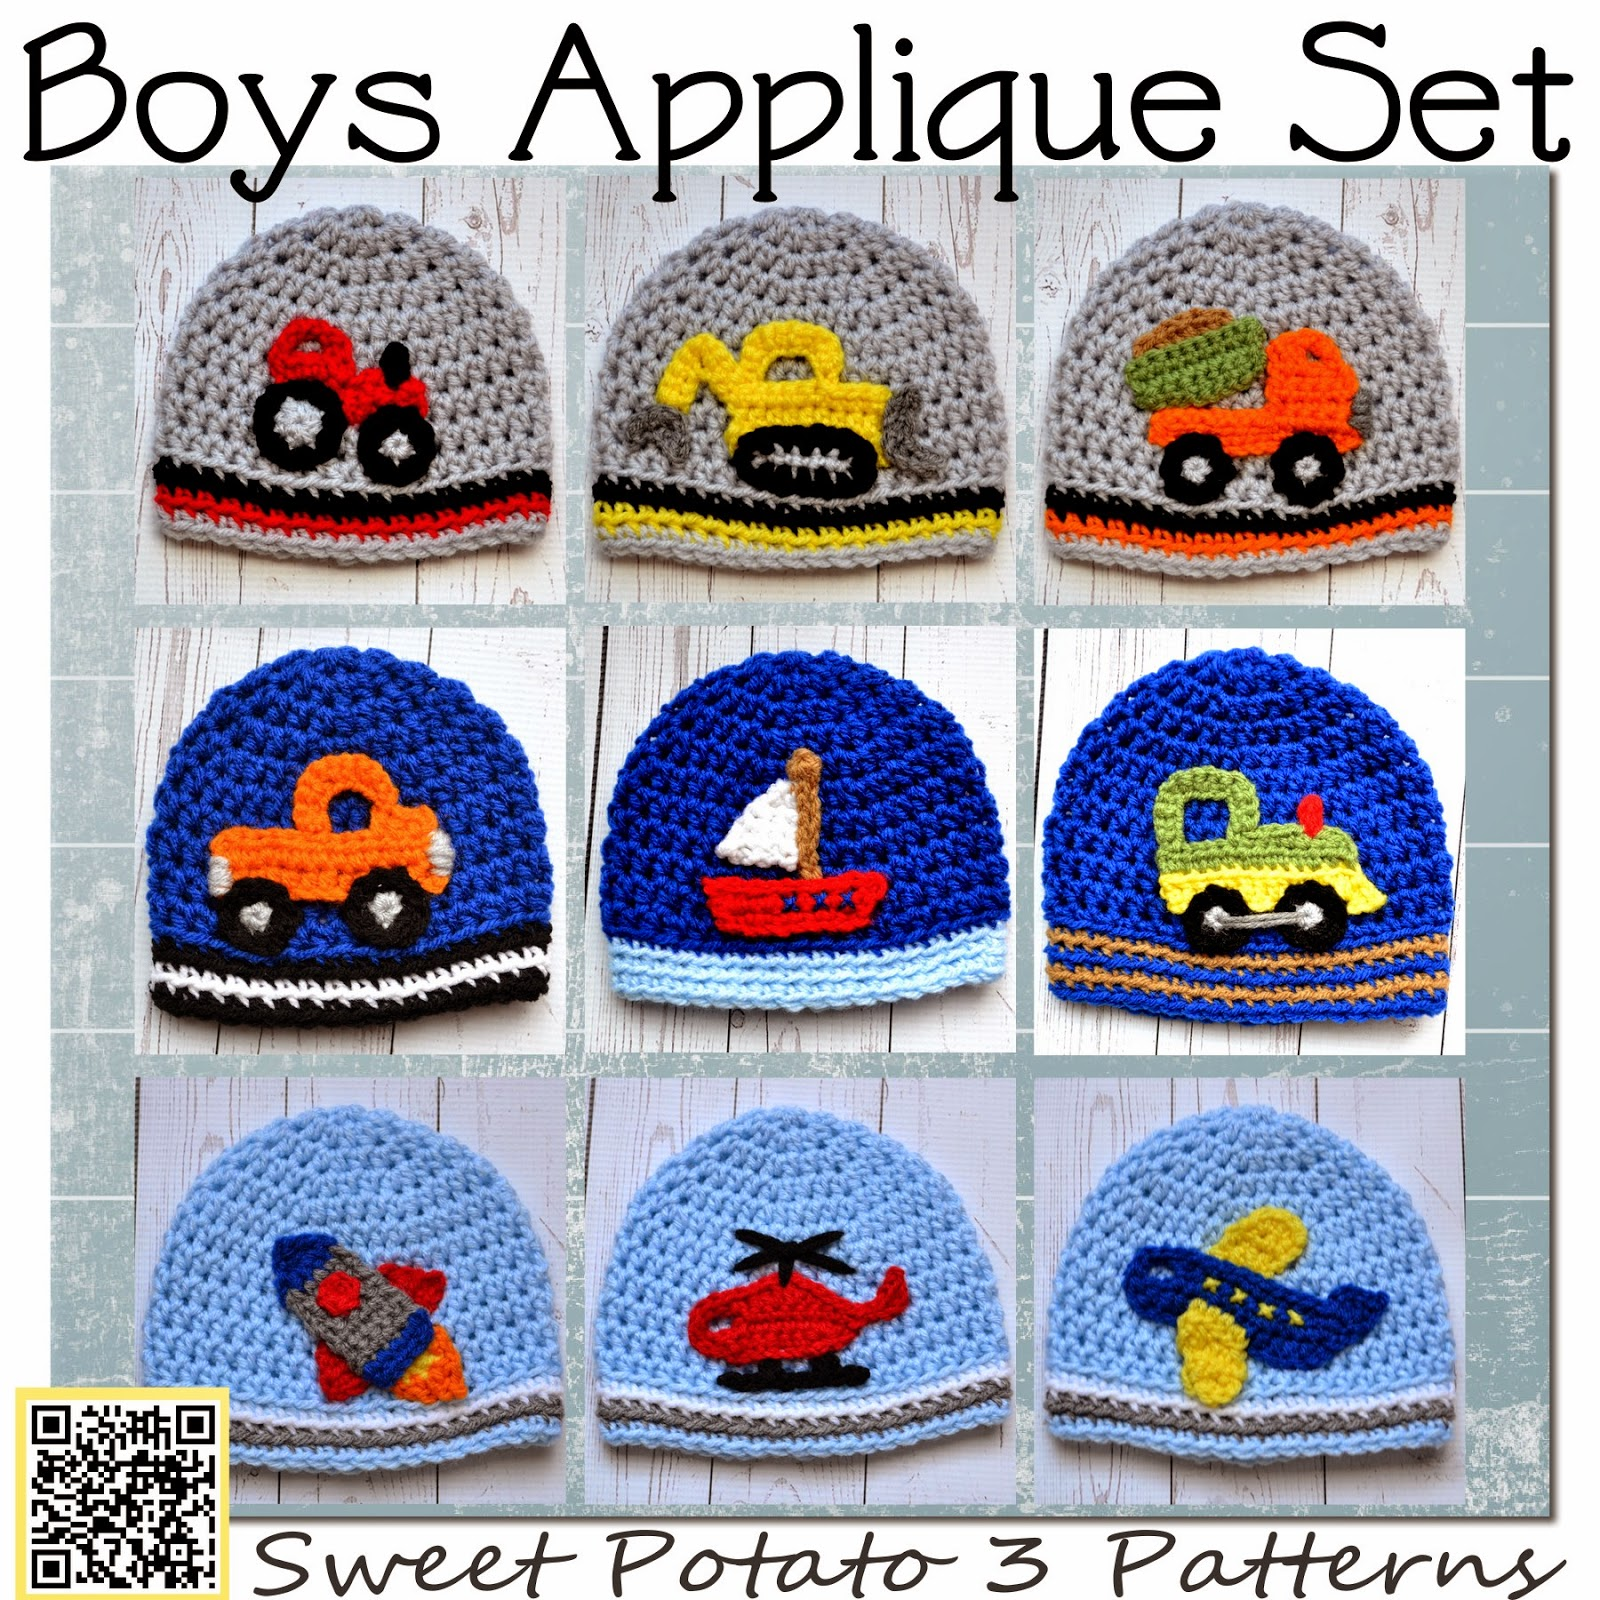 All Boy Applique Crochet Patterns